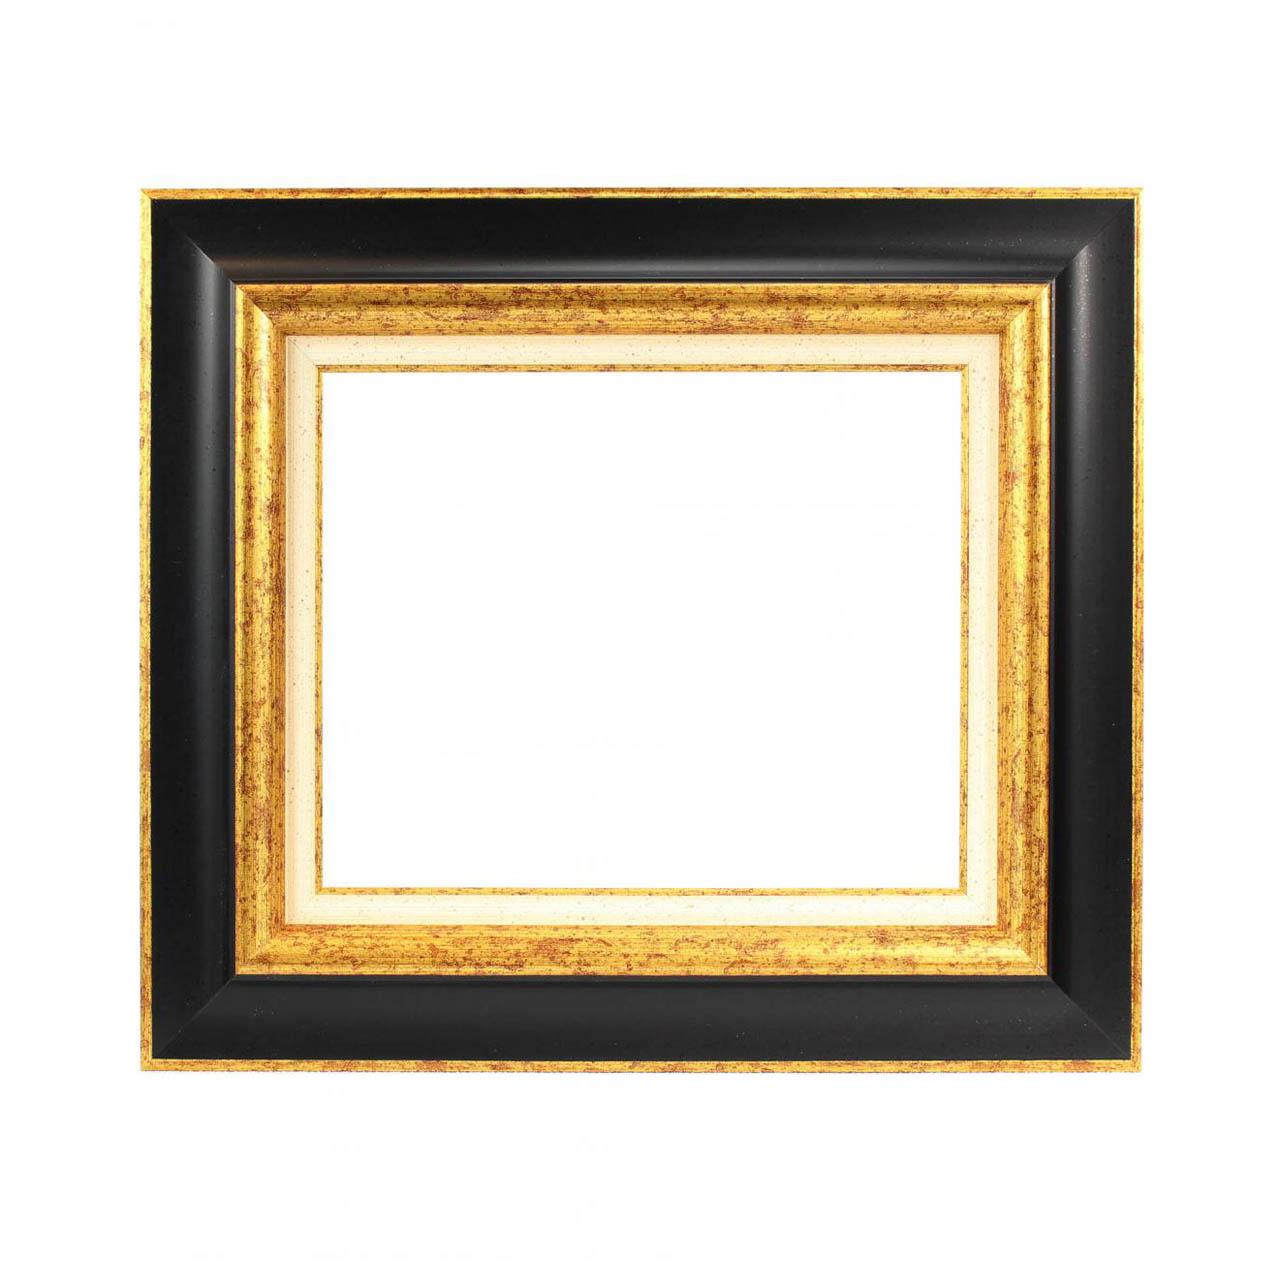 capri noir or cadre pour tableau cadres en stock. Black Bedroom Furniture Sets. Home Design Ideas